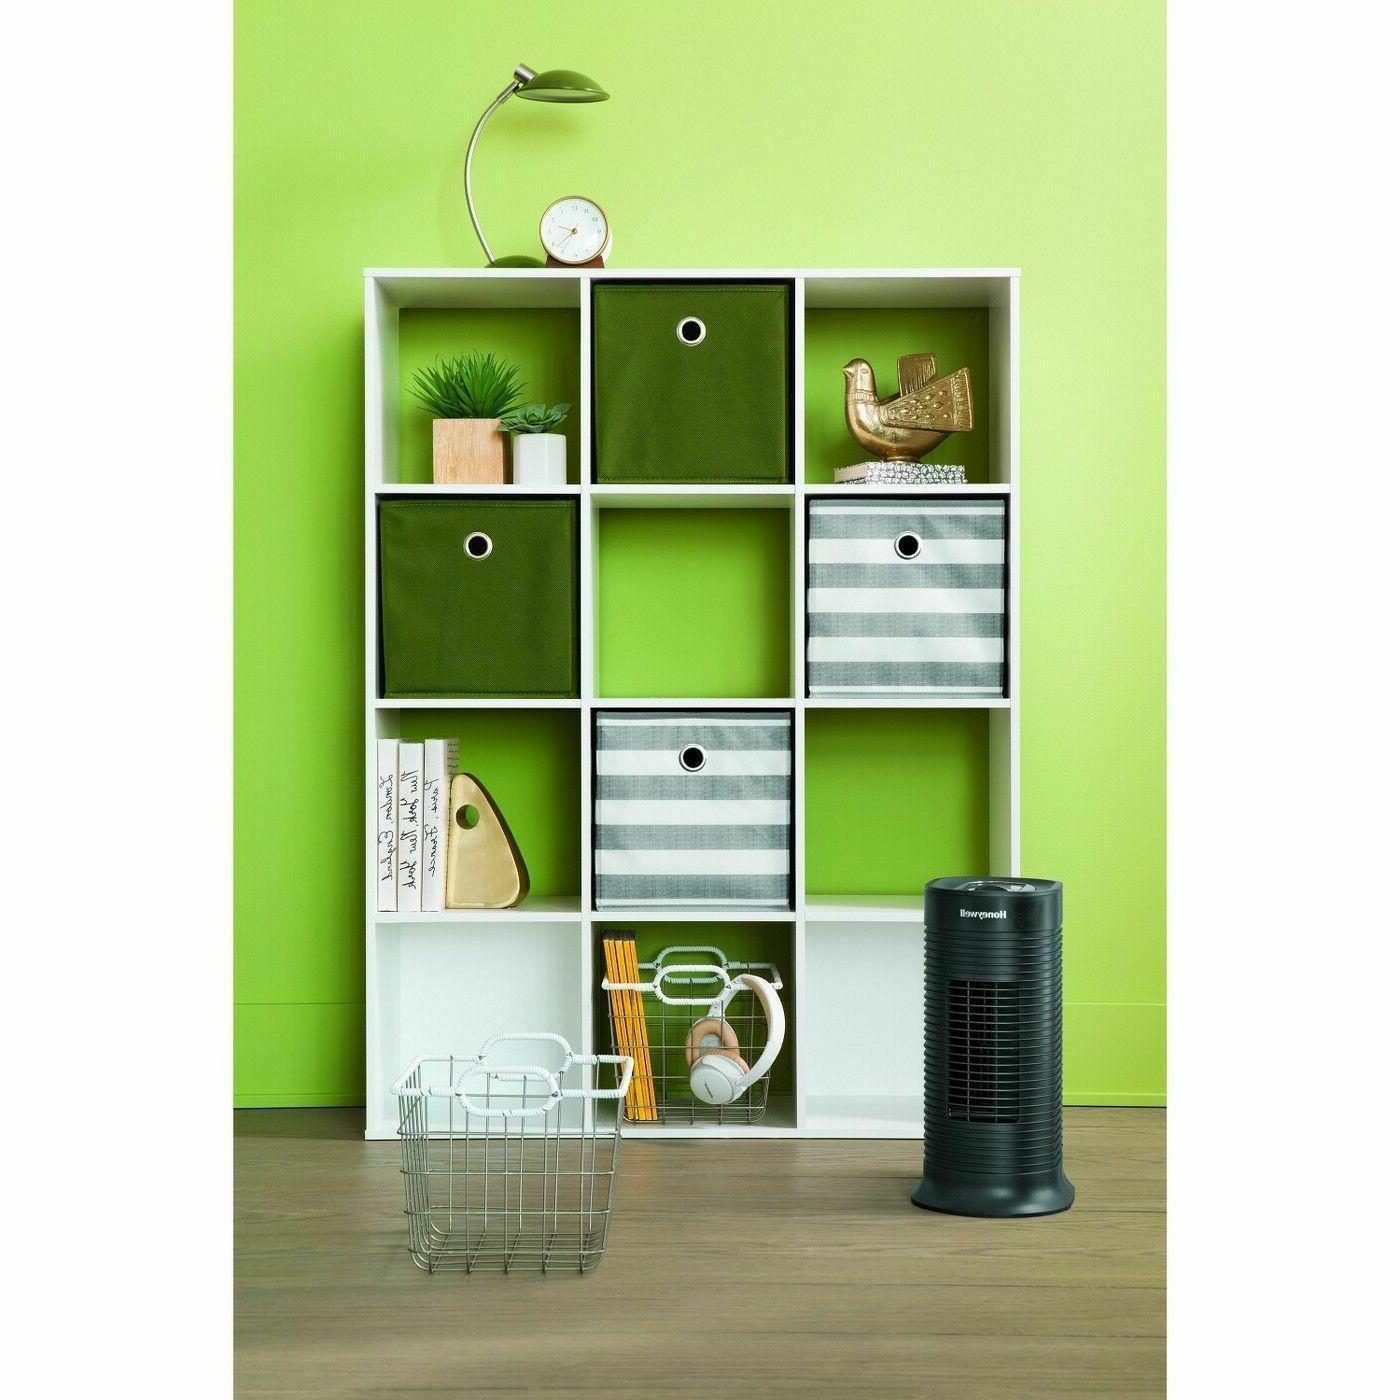 12-Cube Cubby Organizer Closet Shelf Box